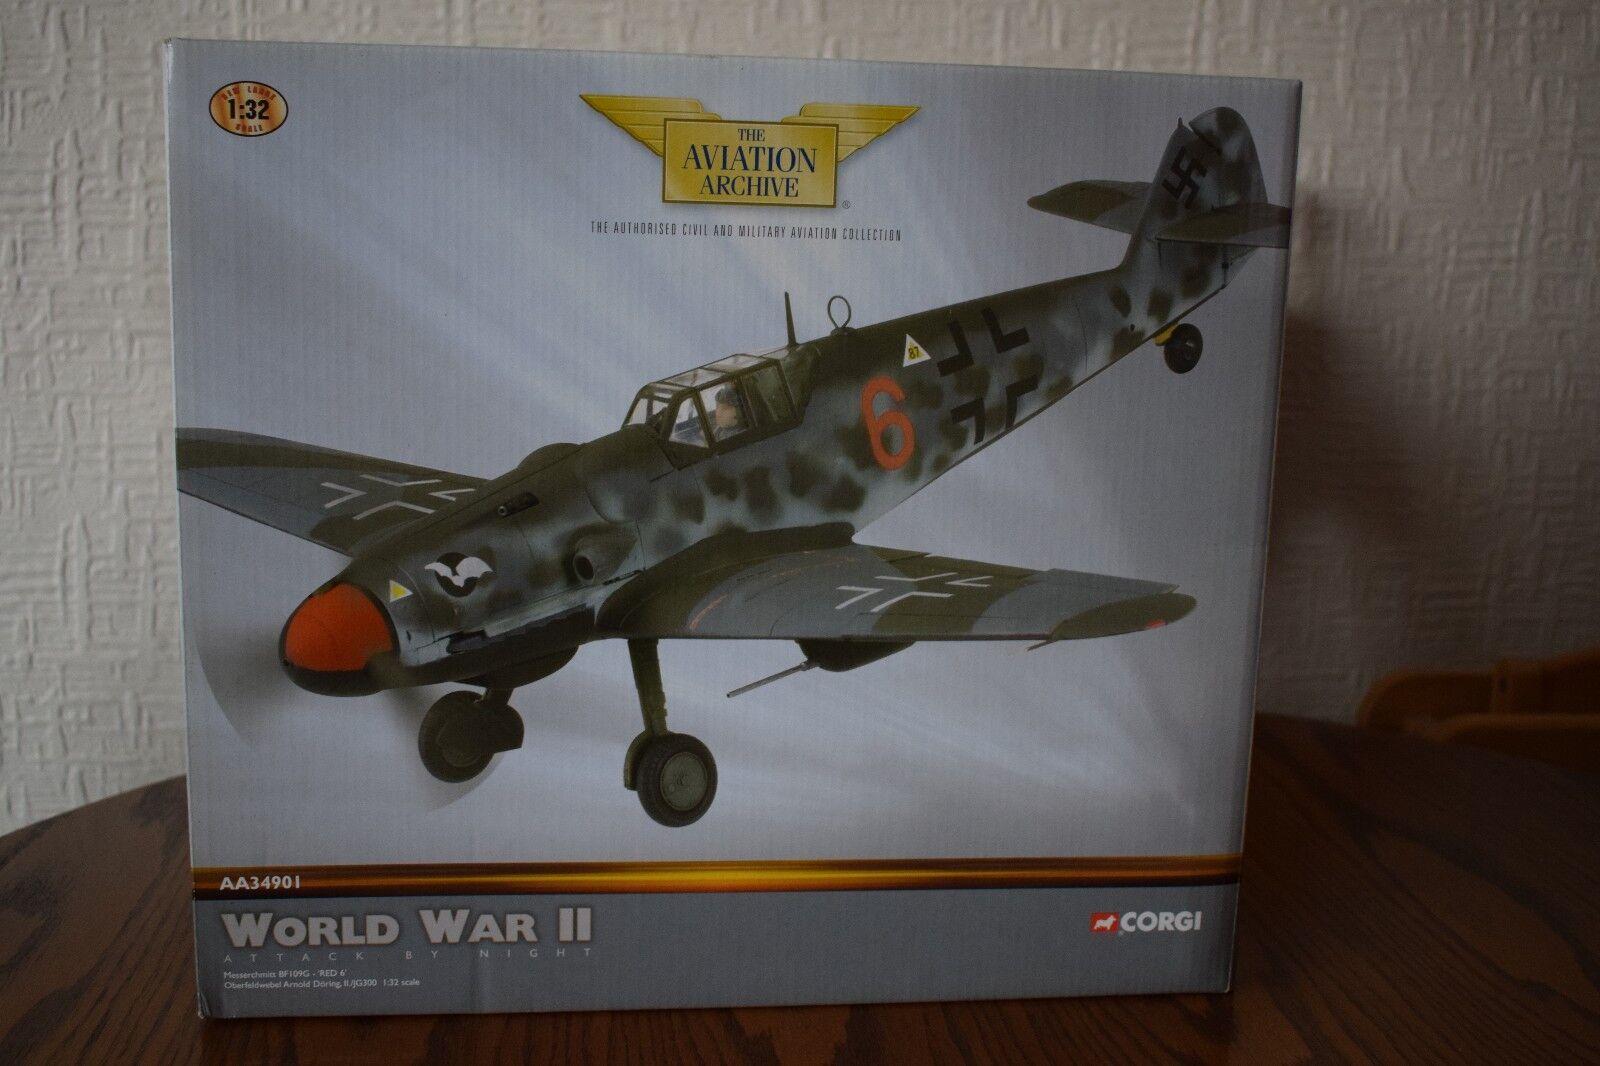 Corgi AA34901 Messerchmitt BF109G Red 6 Arnold Doring 1 32 scale Die Cast Model